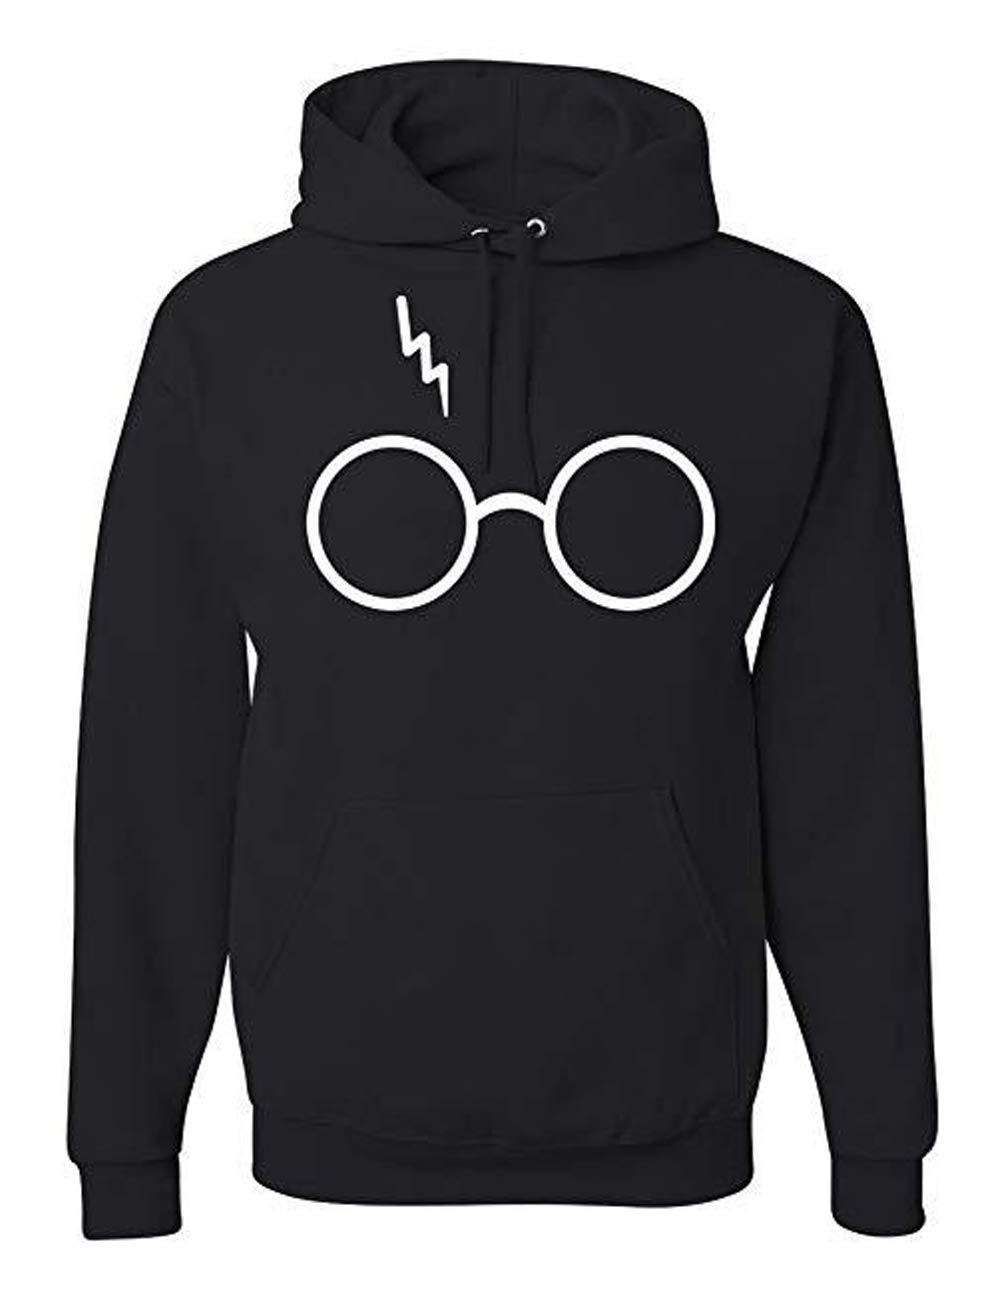 AURNEW Harry Potter Glasses Scar Unisex Hooded Sweatshirt Fashion Hoodie (Black, L)